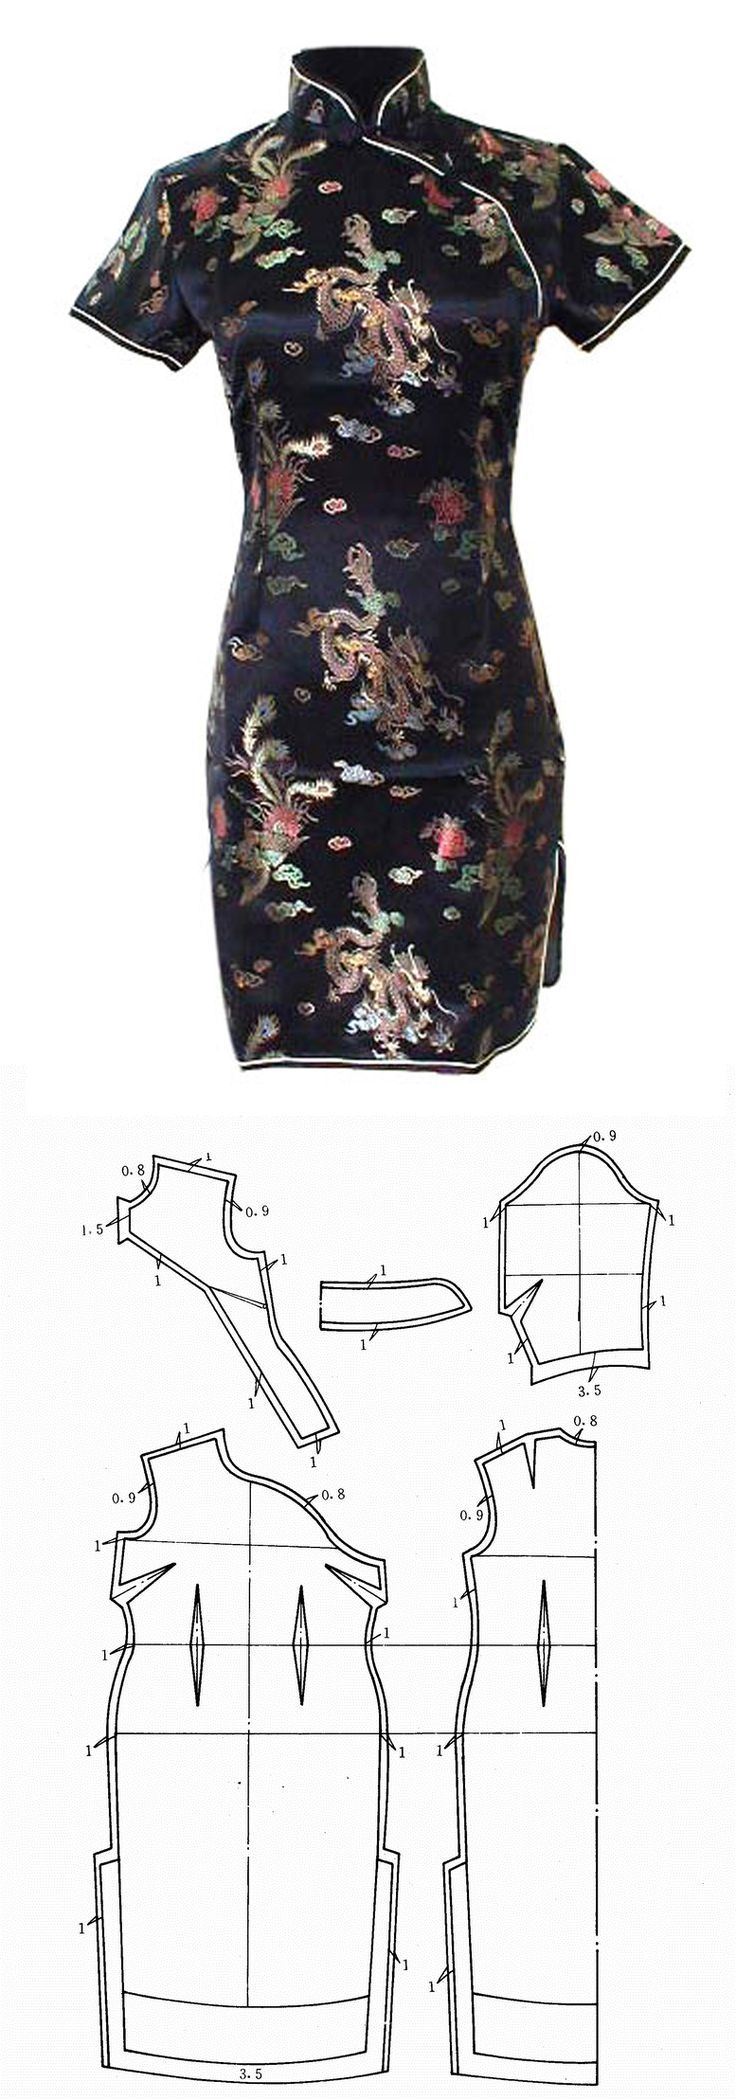 Maple Chong  - qipao - Tradicional chinese dress pattern -